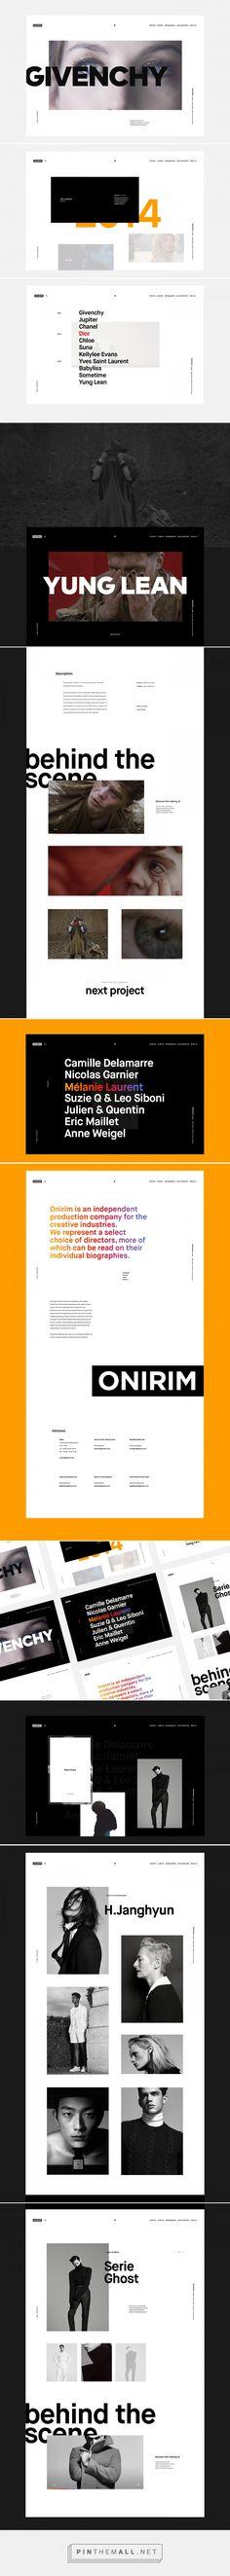 Onirim - Website on Behance - created via https://pinthemall.net